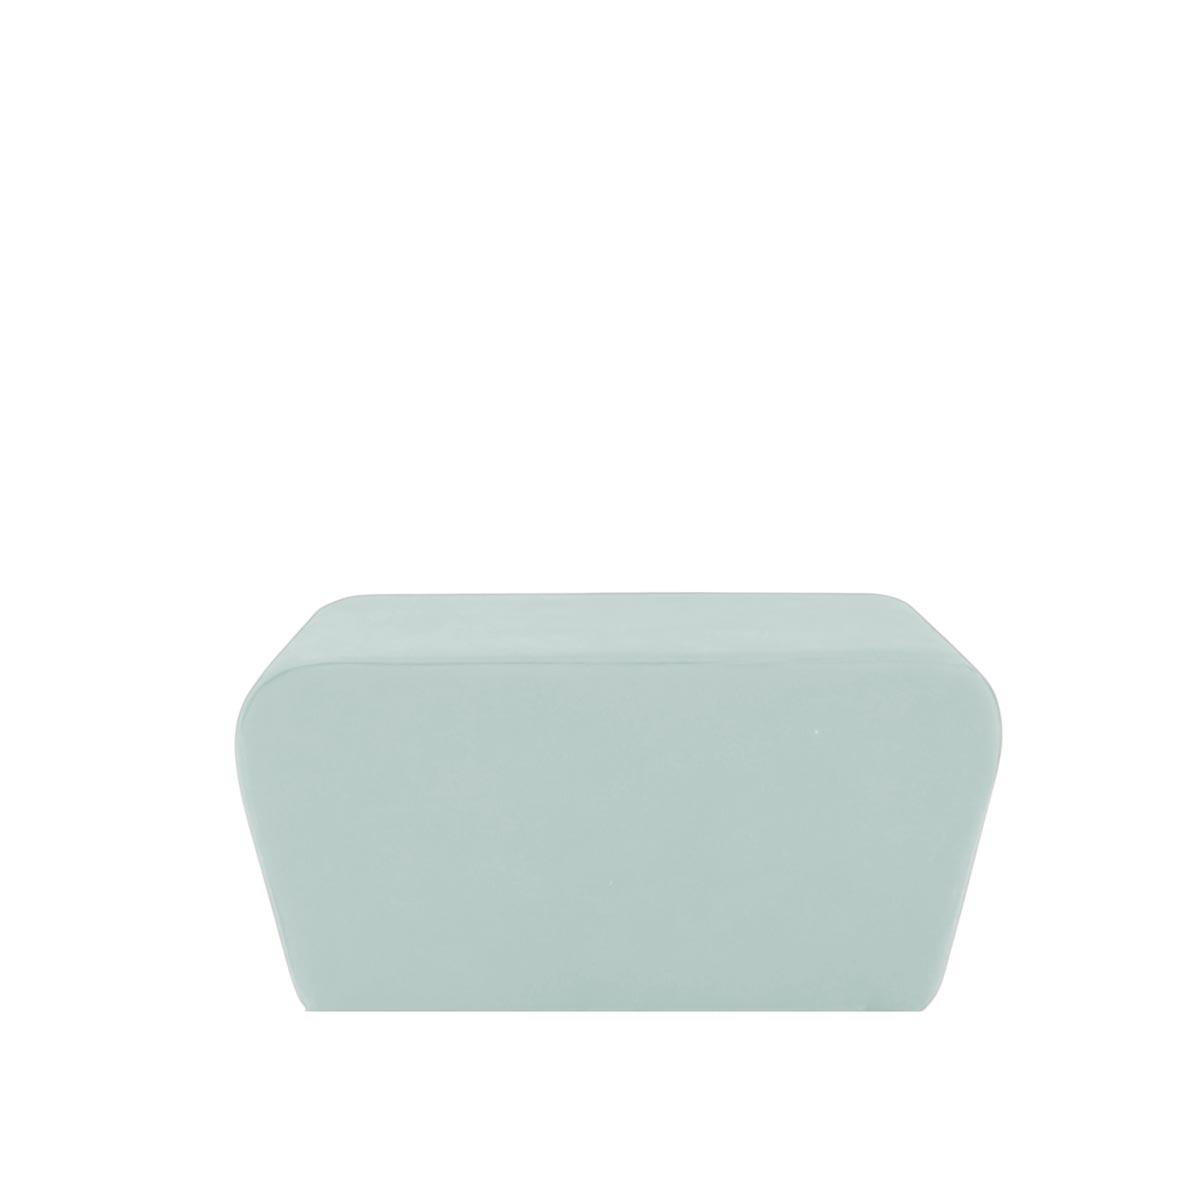 Pufe Muss R02 Tecido Lonita Ice 03